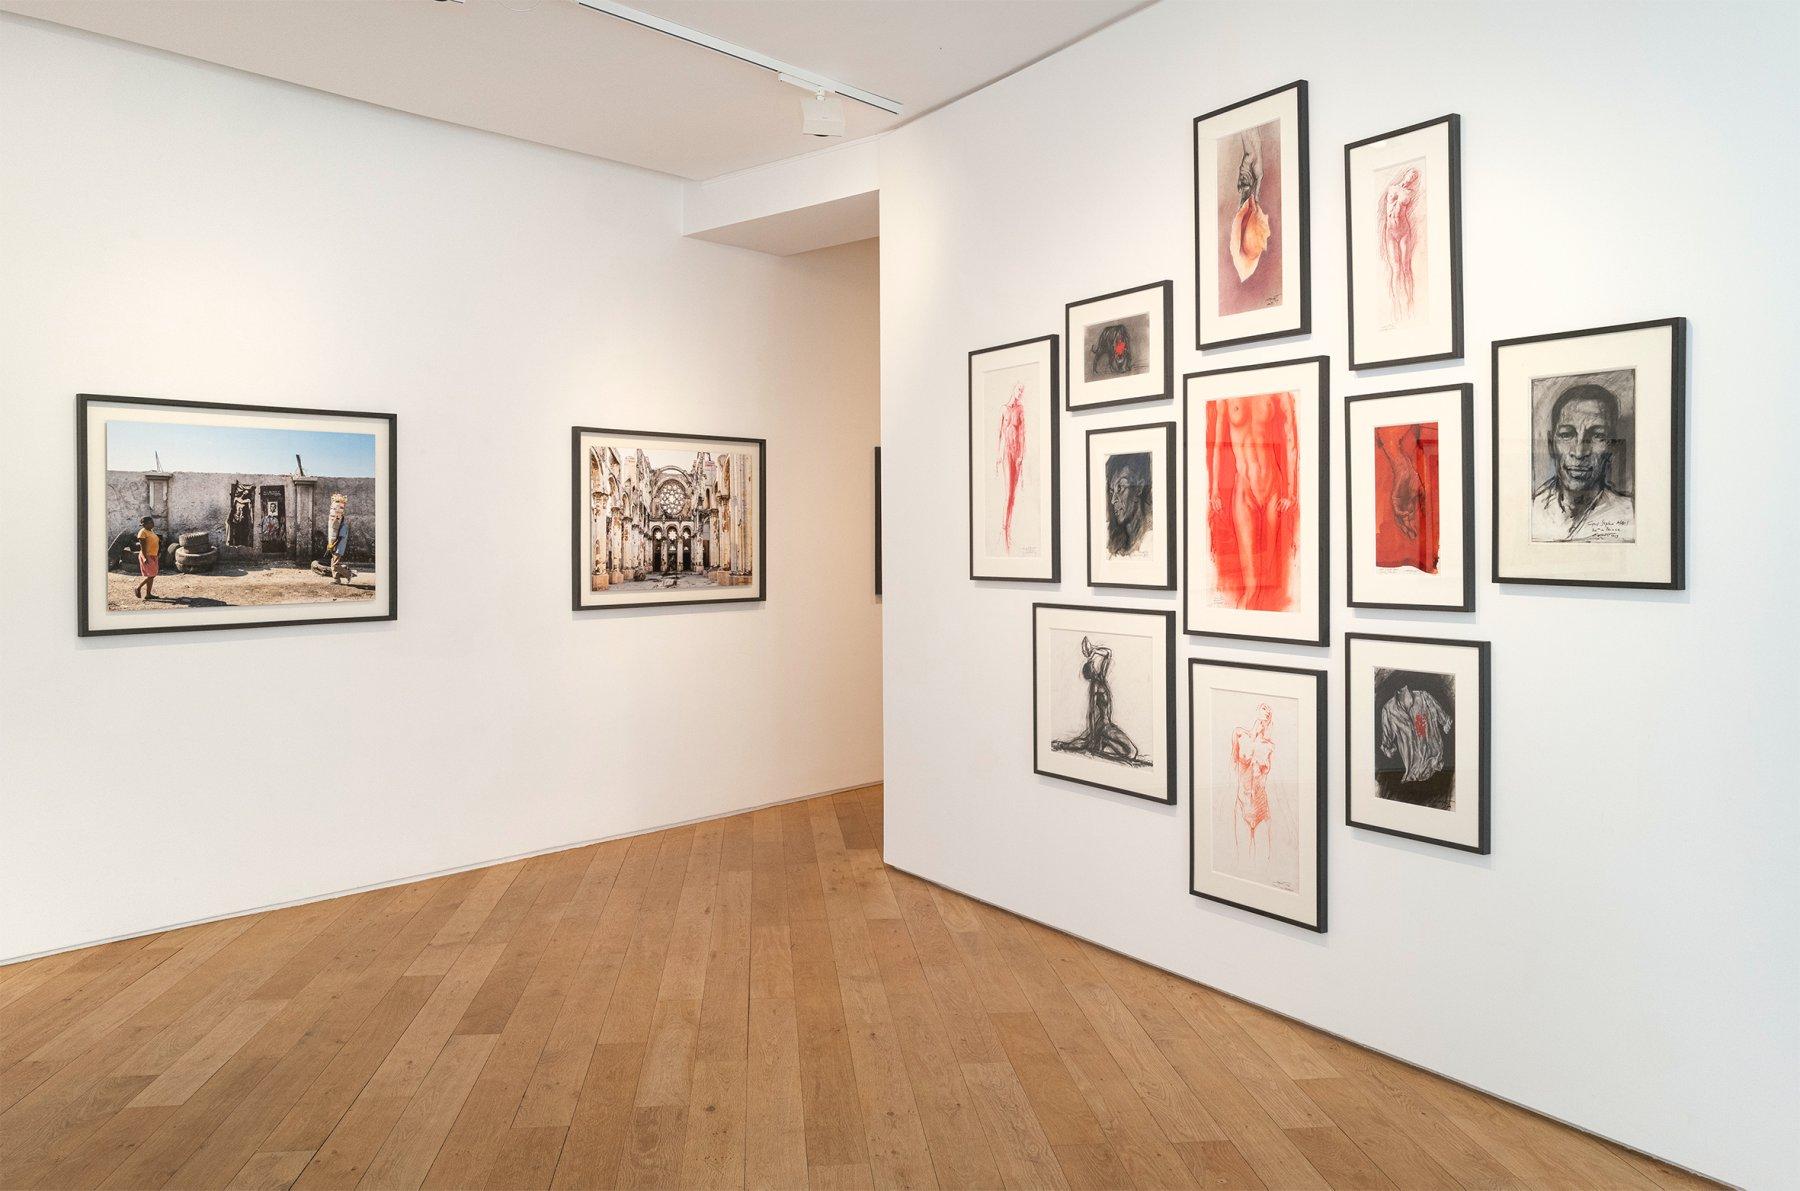 Galerie Lelong Co Matignon Ernest Pignon-Ernest 1